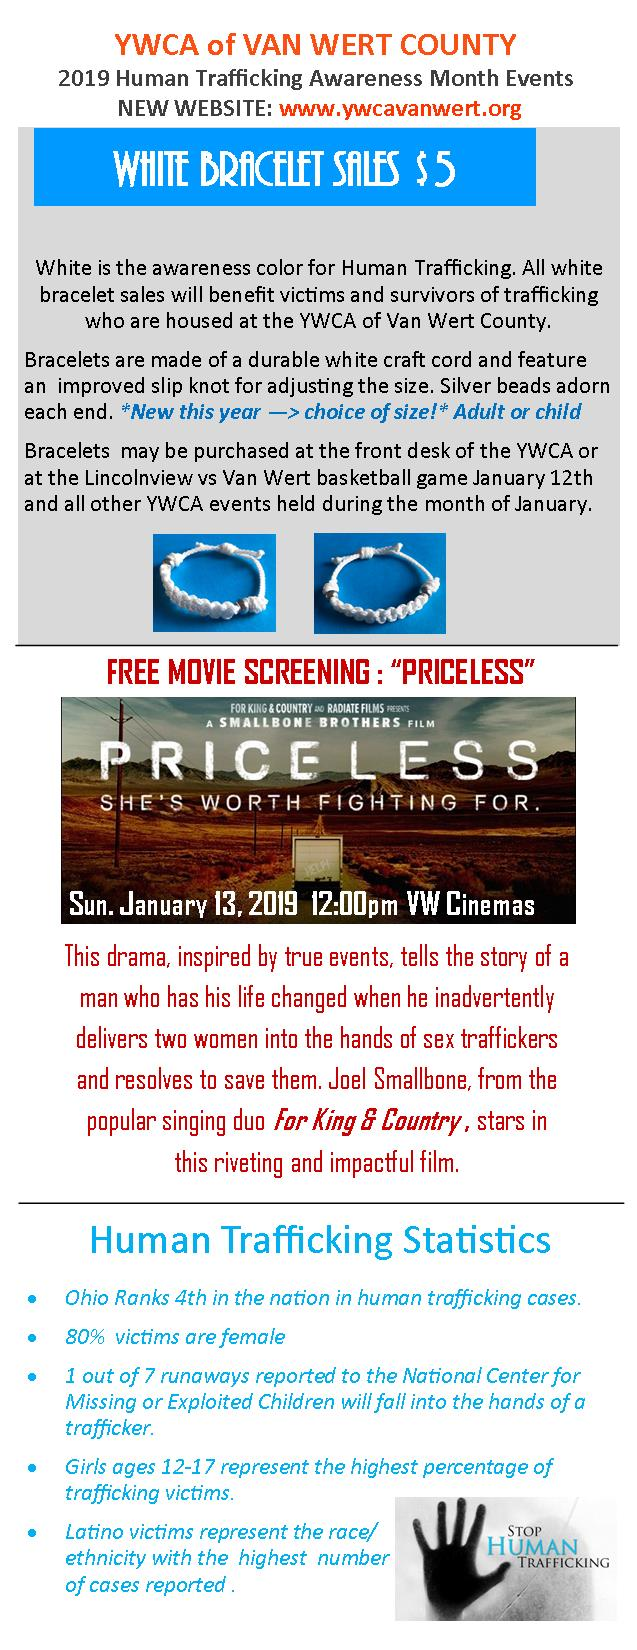 YWCA Human Trafficking Awareness Month flyer - back side